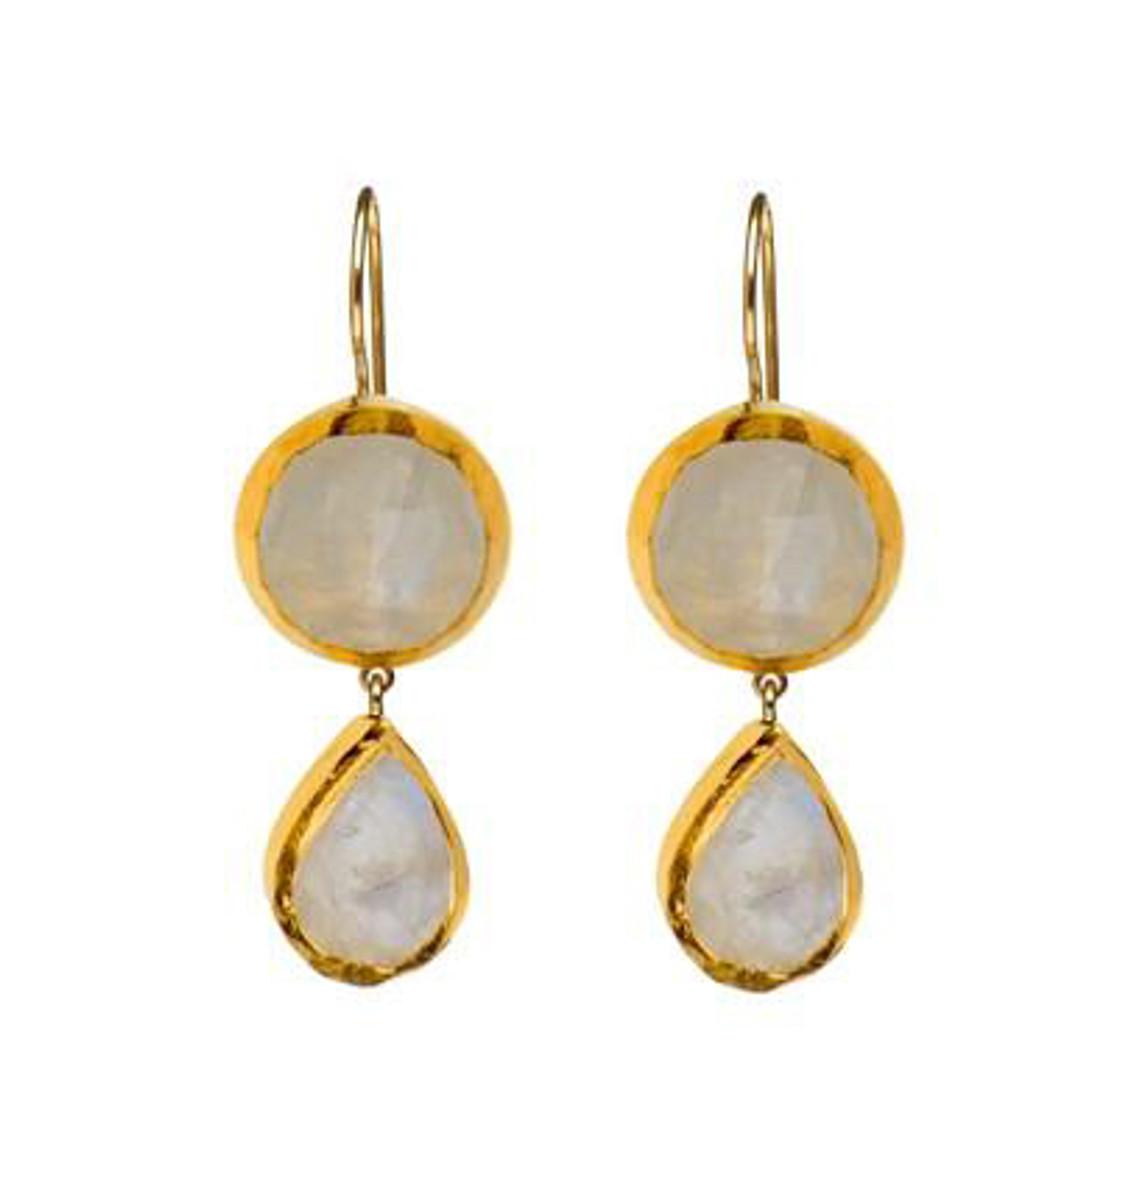 Wishful Moonstone Earrings by Nava Zahavi - New Arrival